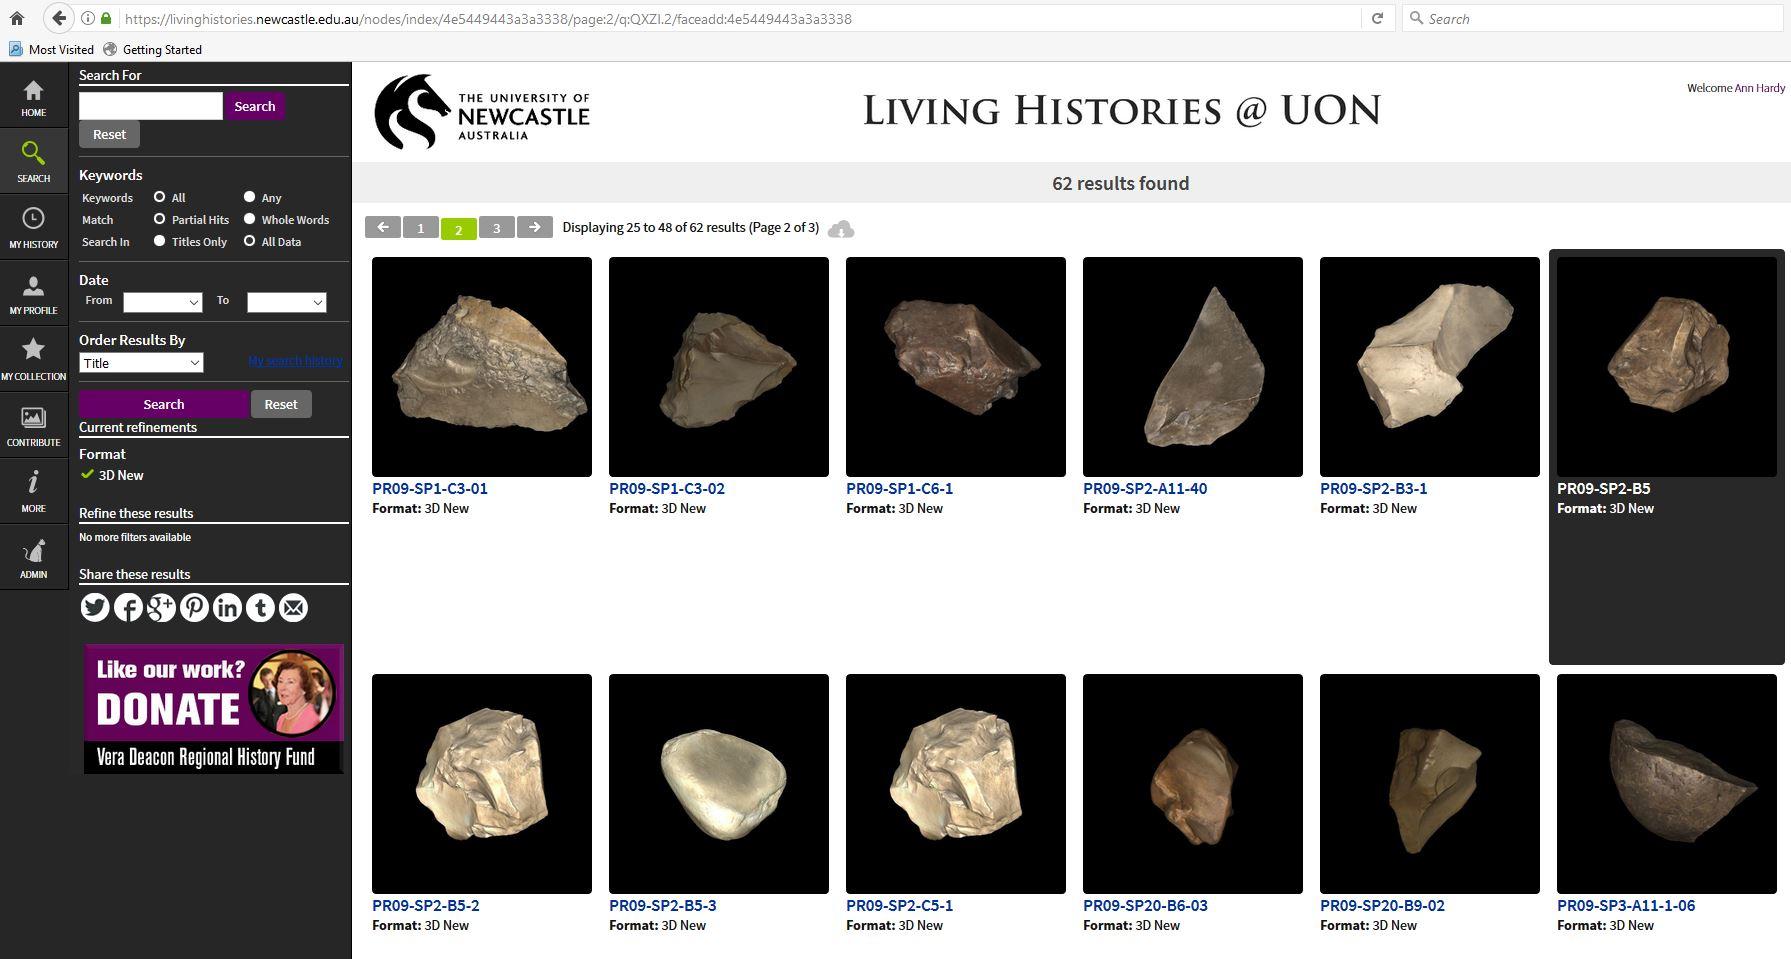 Recollect - 3D artefacts